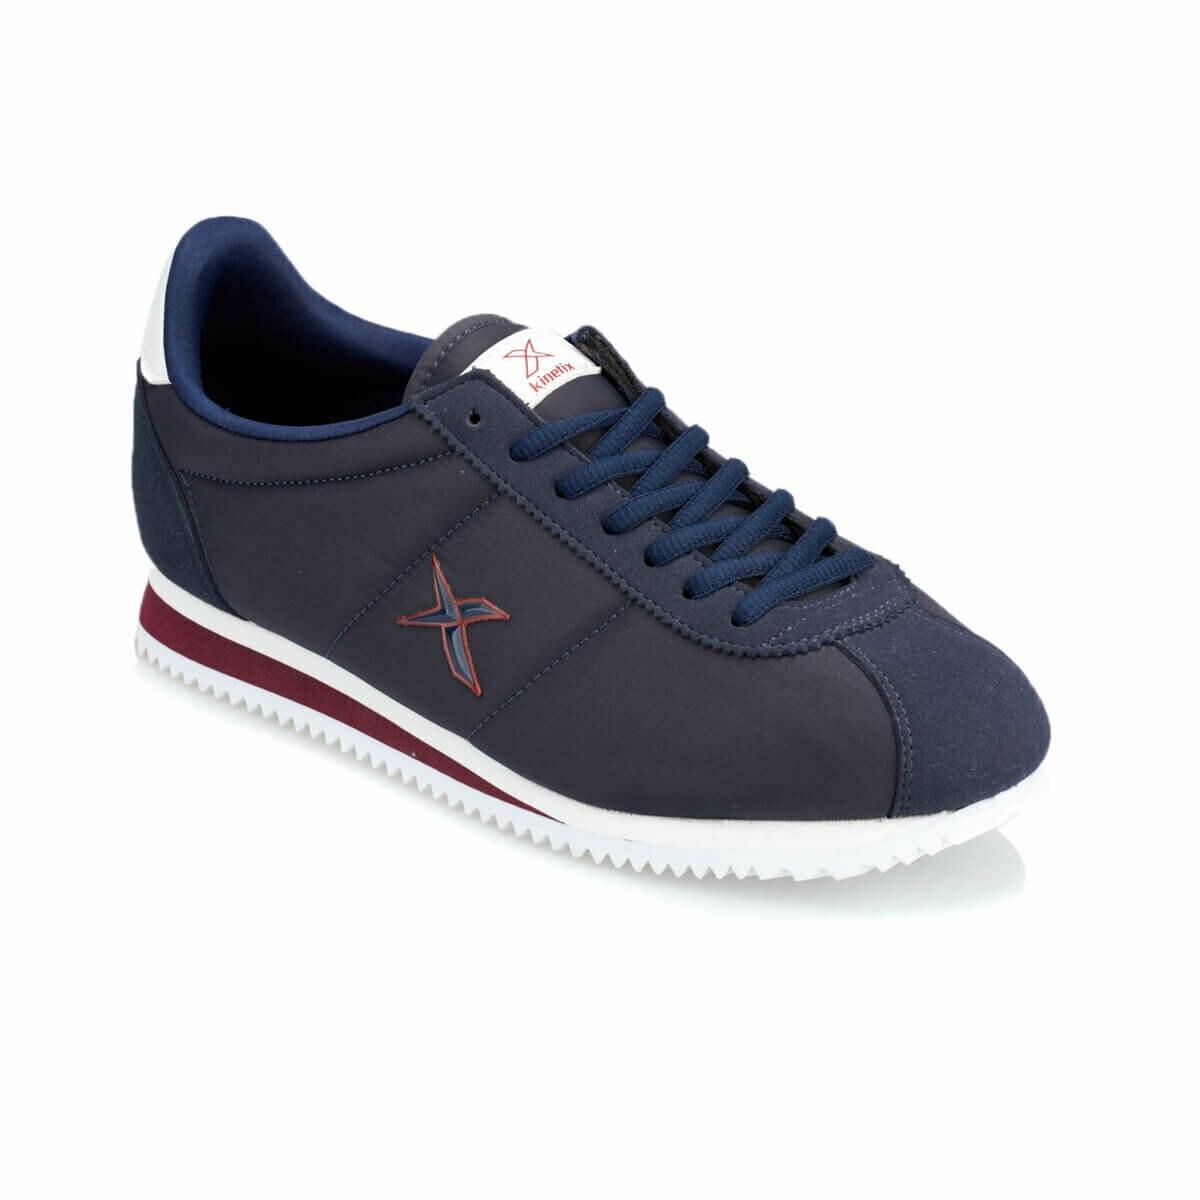 FLO ANTON White Men 'S Sneaker Shoes KINETIX